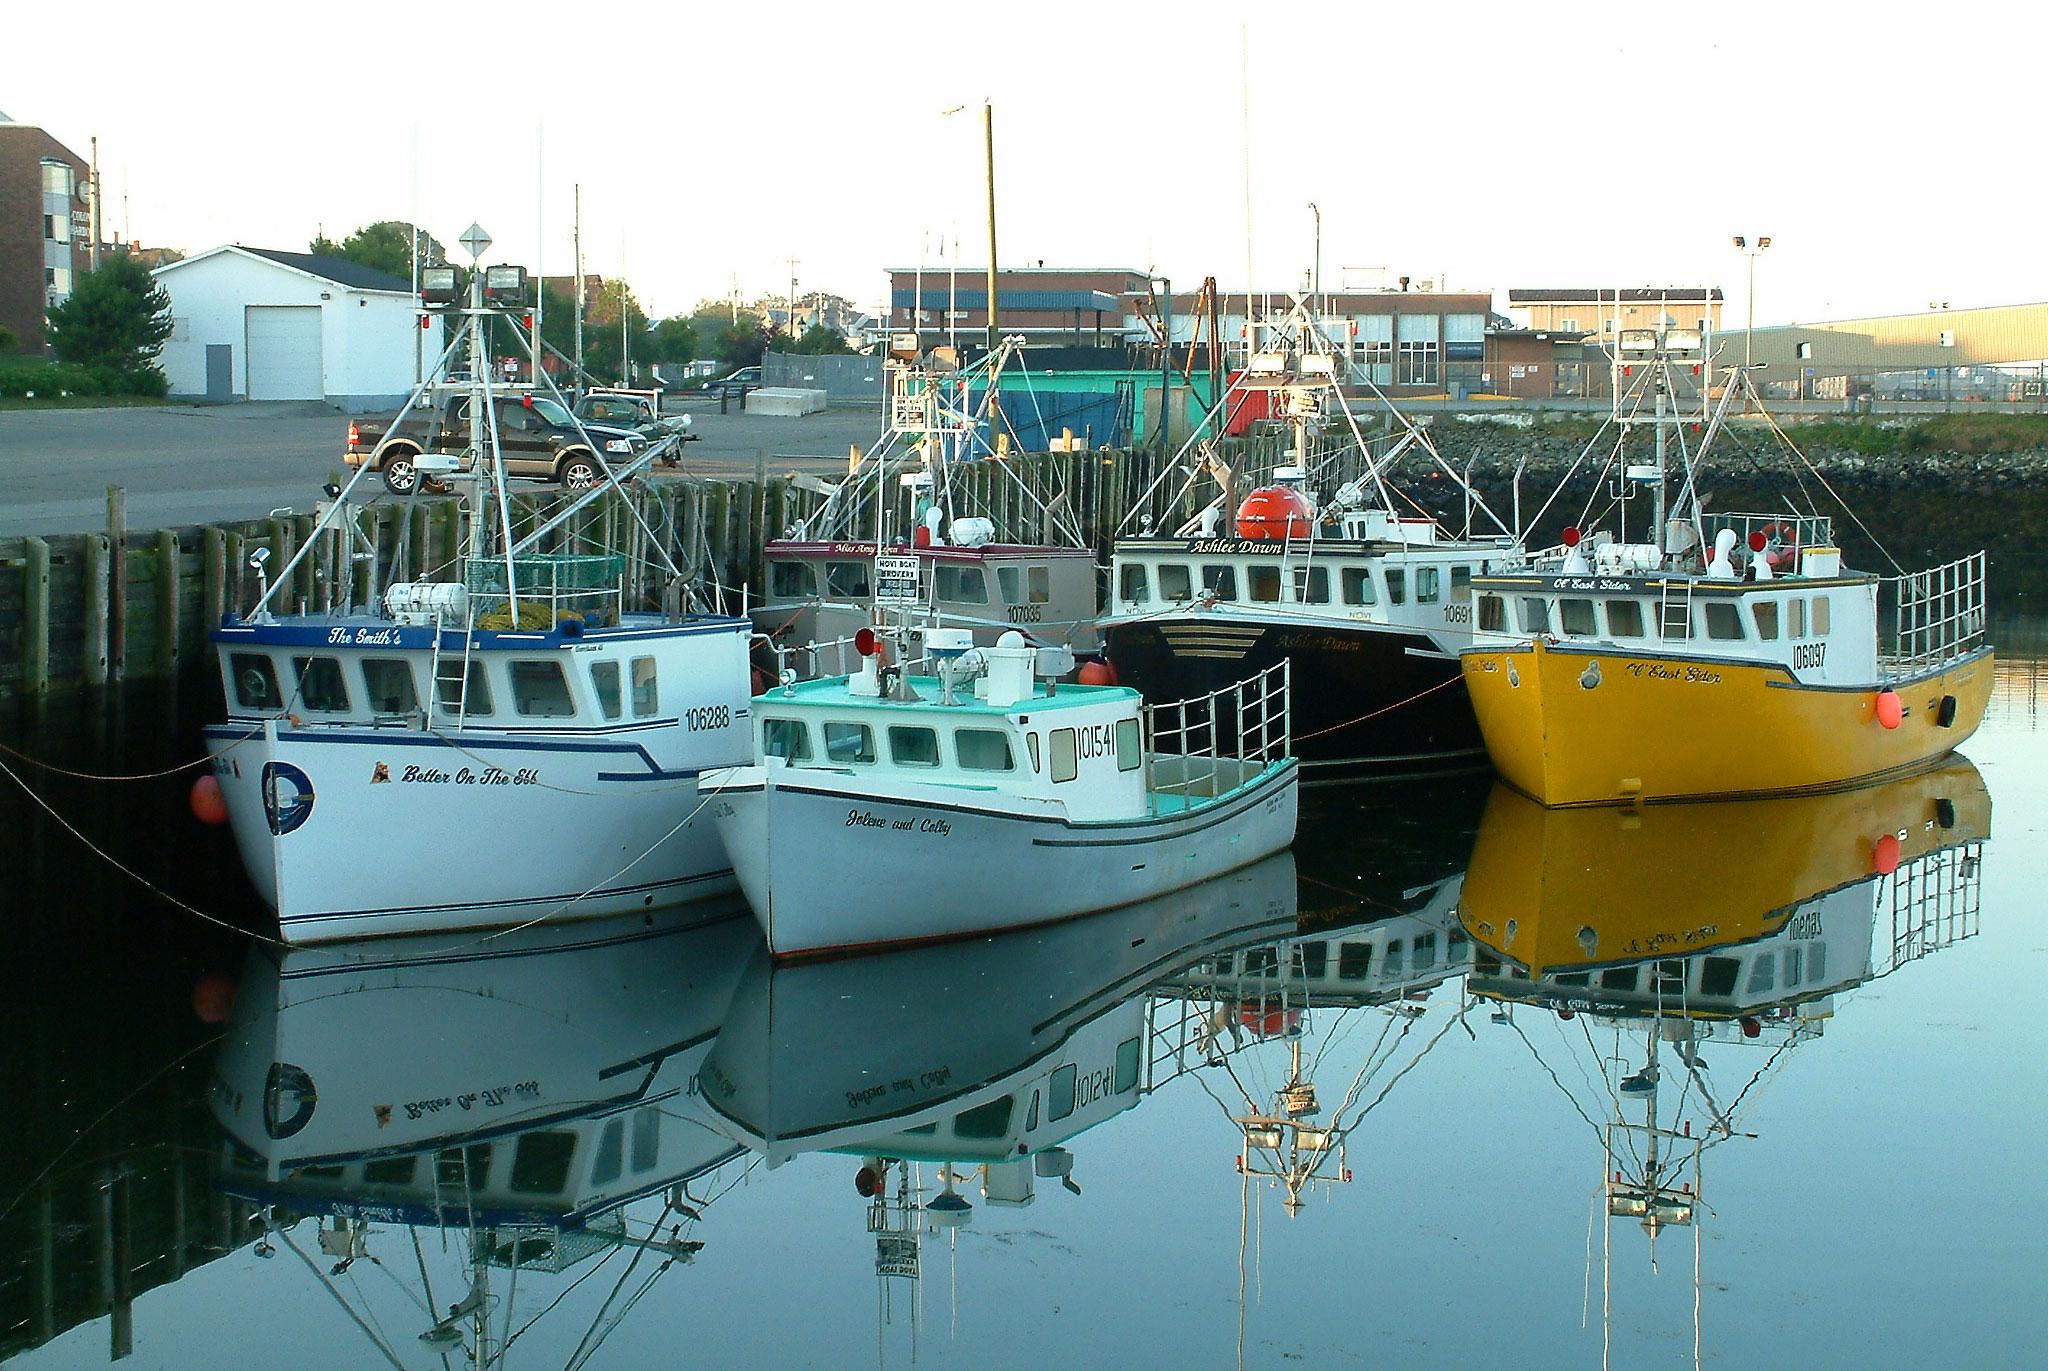 Sea fishing boats on ebay uk